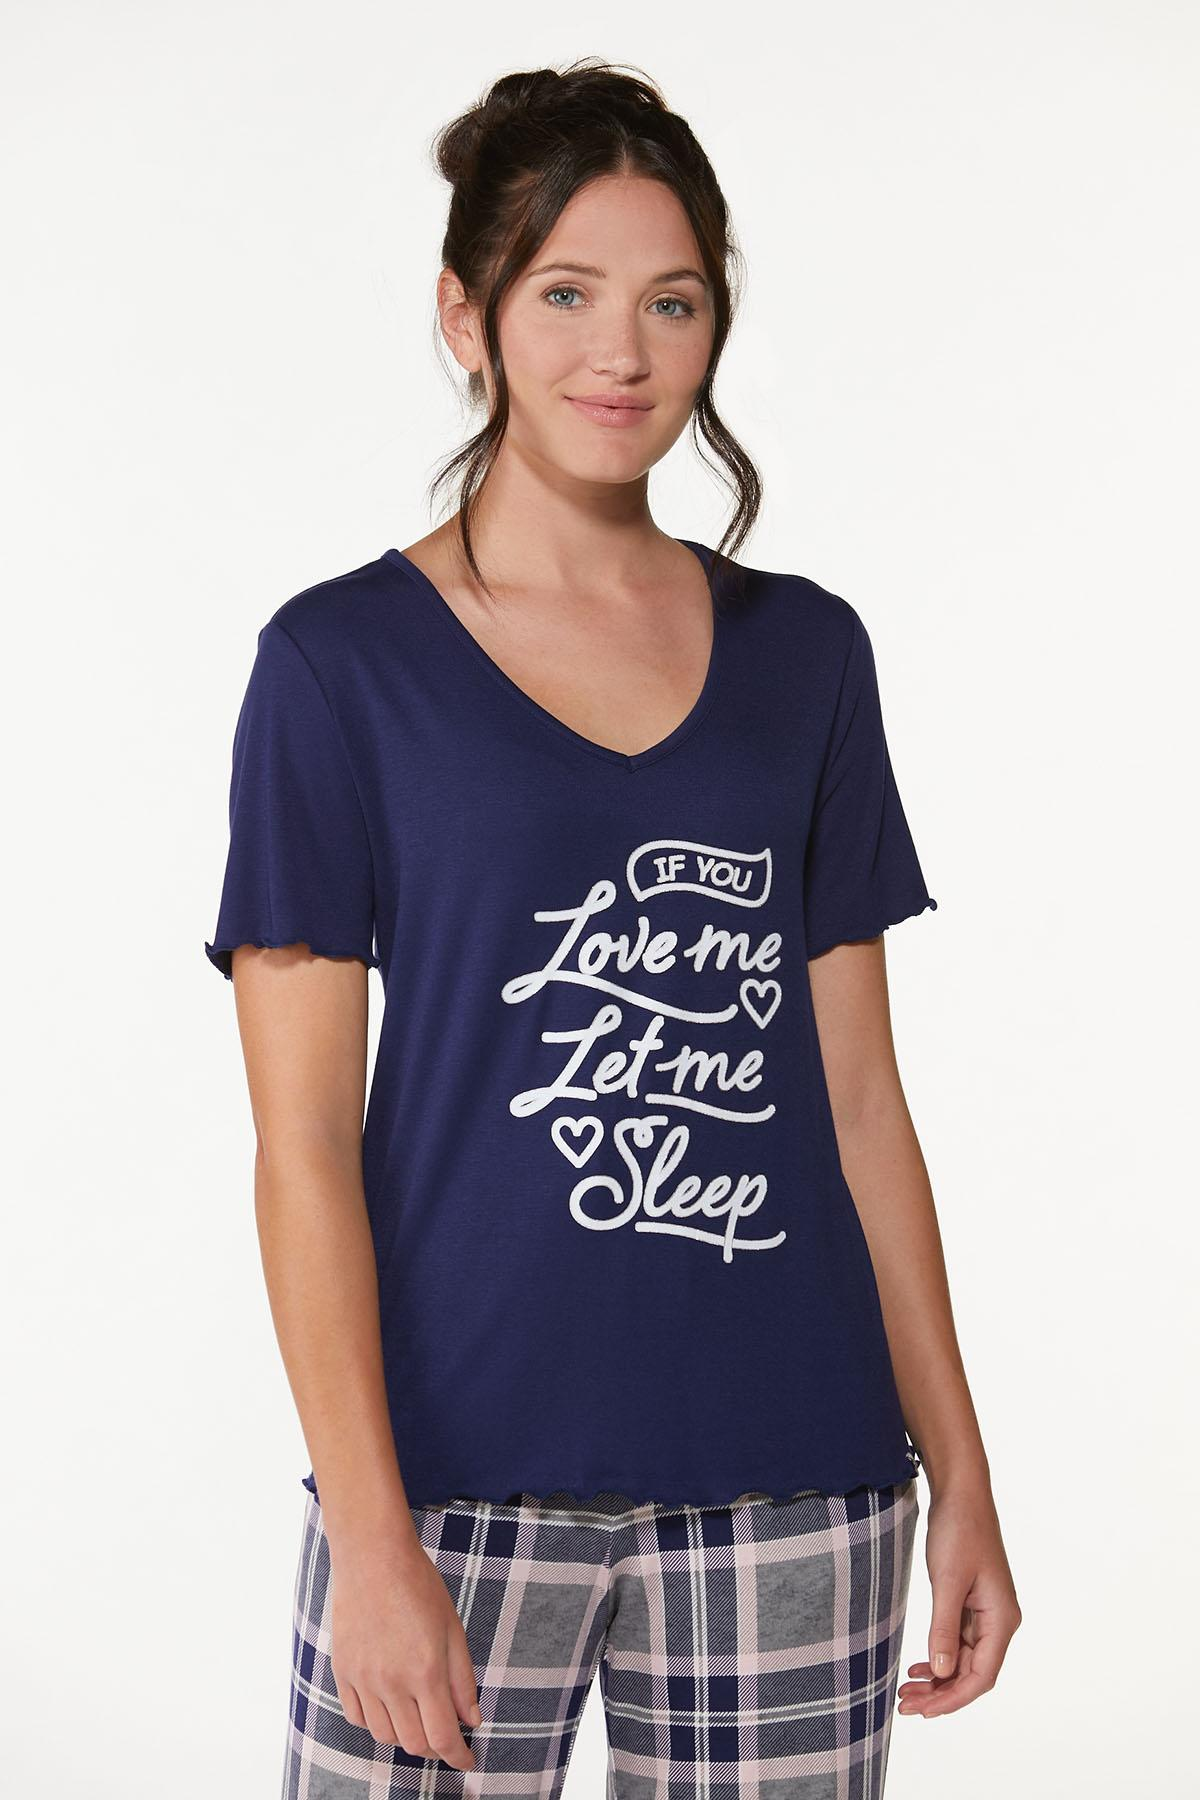 Let Me Sleep Tee